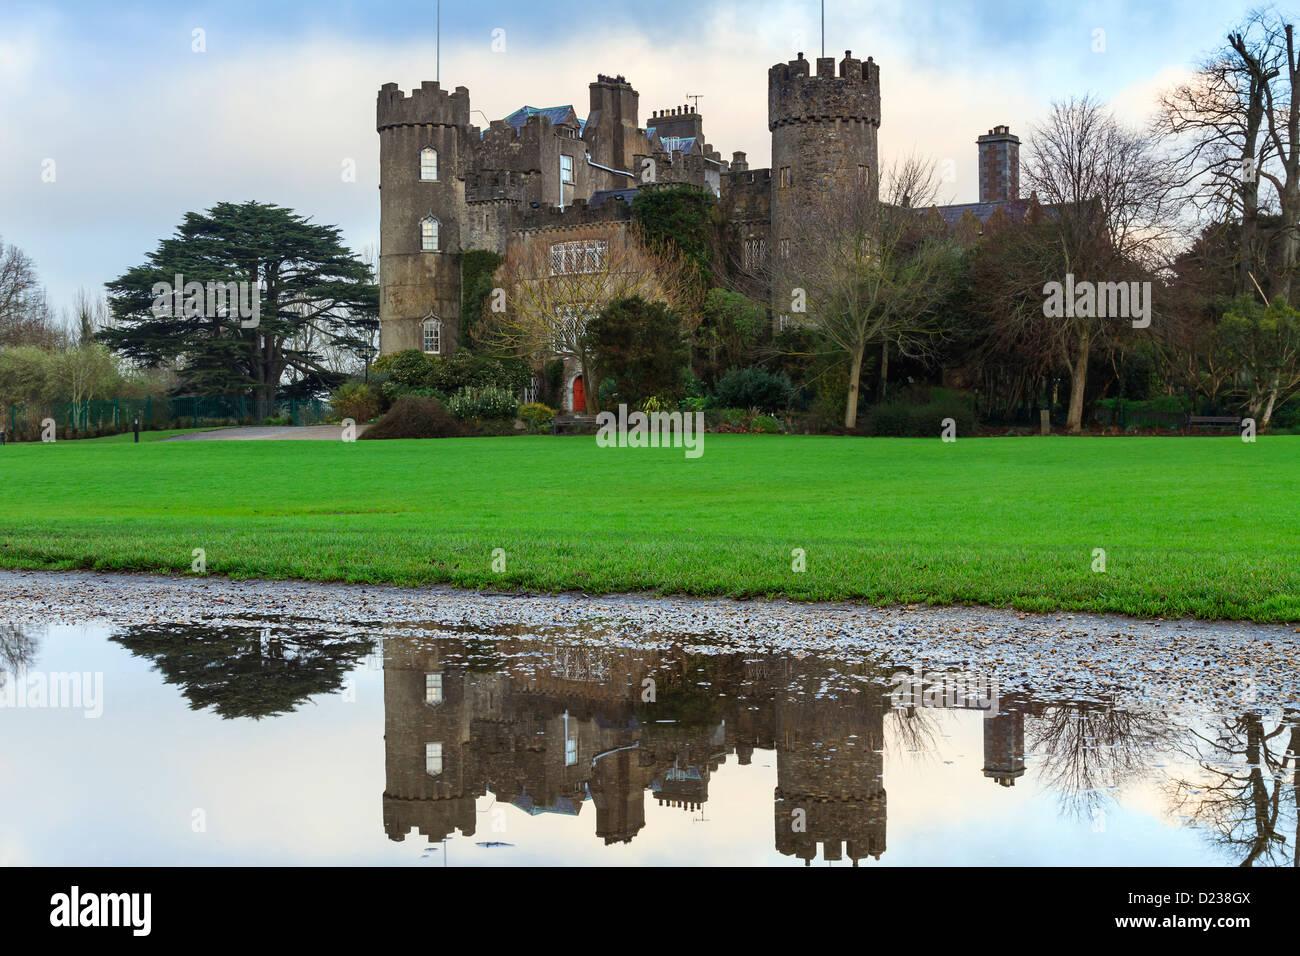 Things to Do in Malahide | Visit Dublin